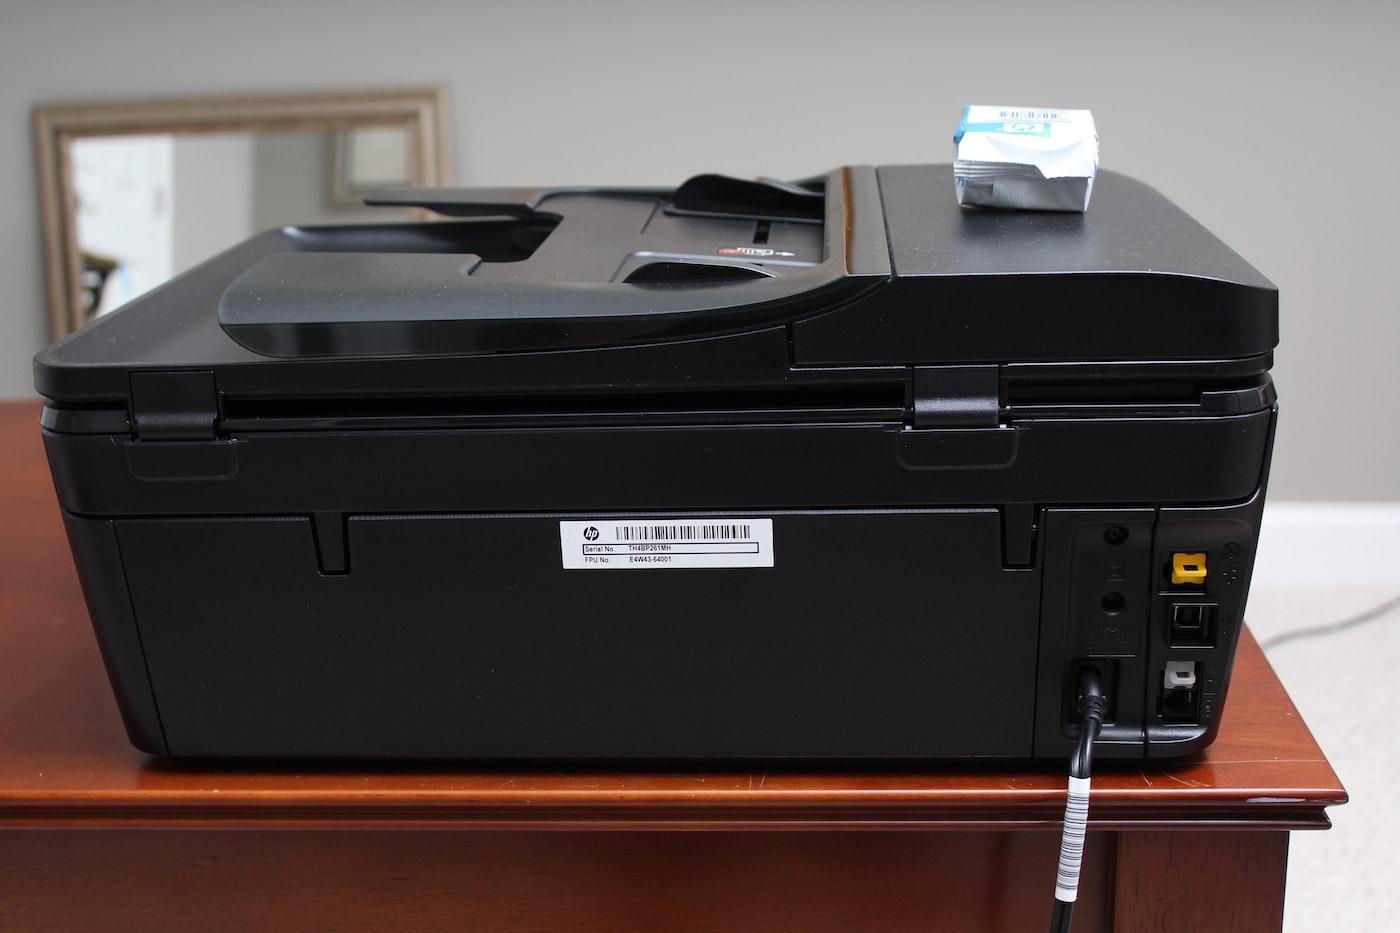 hp envy 7640 all in one printer ebth. Black Bedroom Furniture Sets. Home Design Ideas